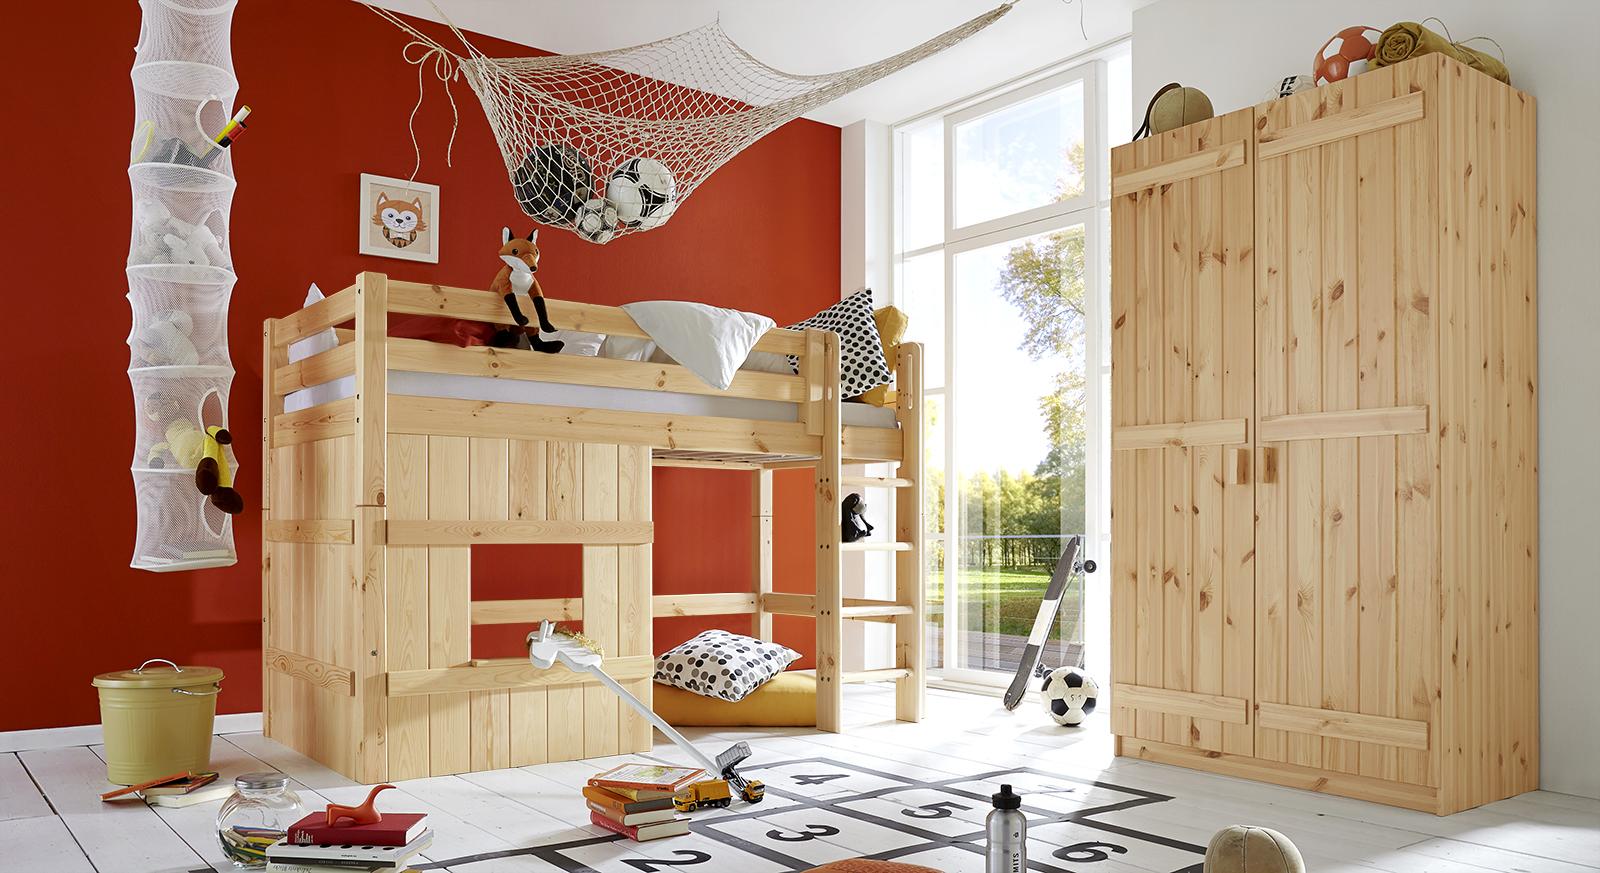 Passende Produkte zum Hütten-Hochbett Kids Paradise